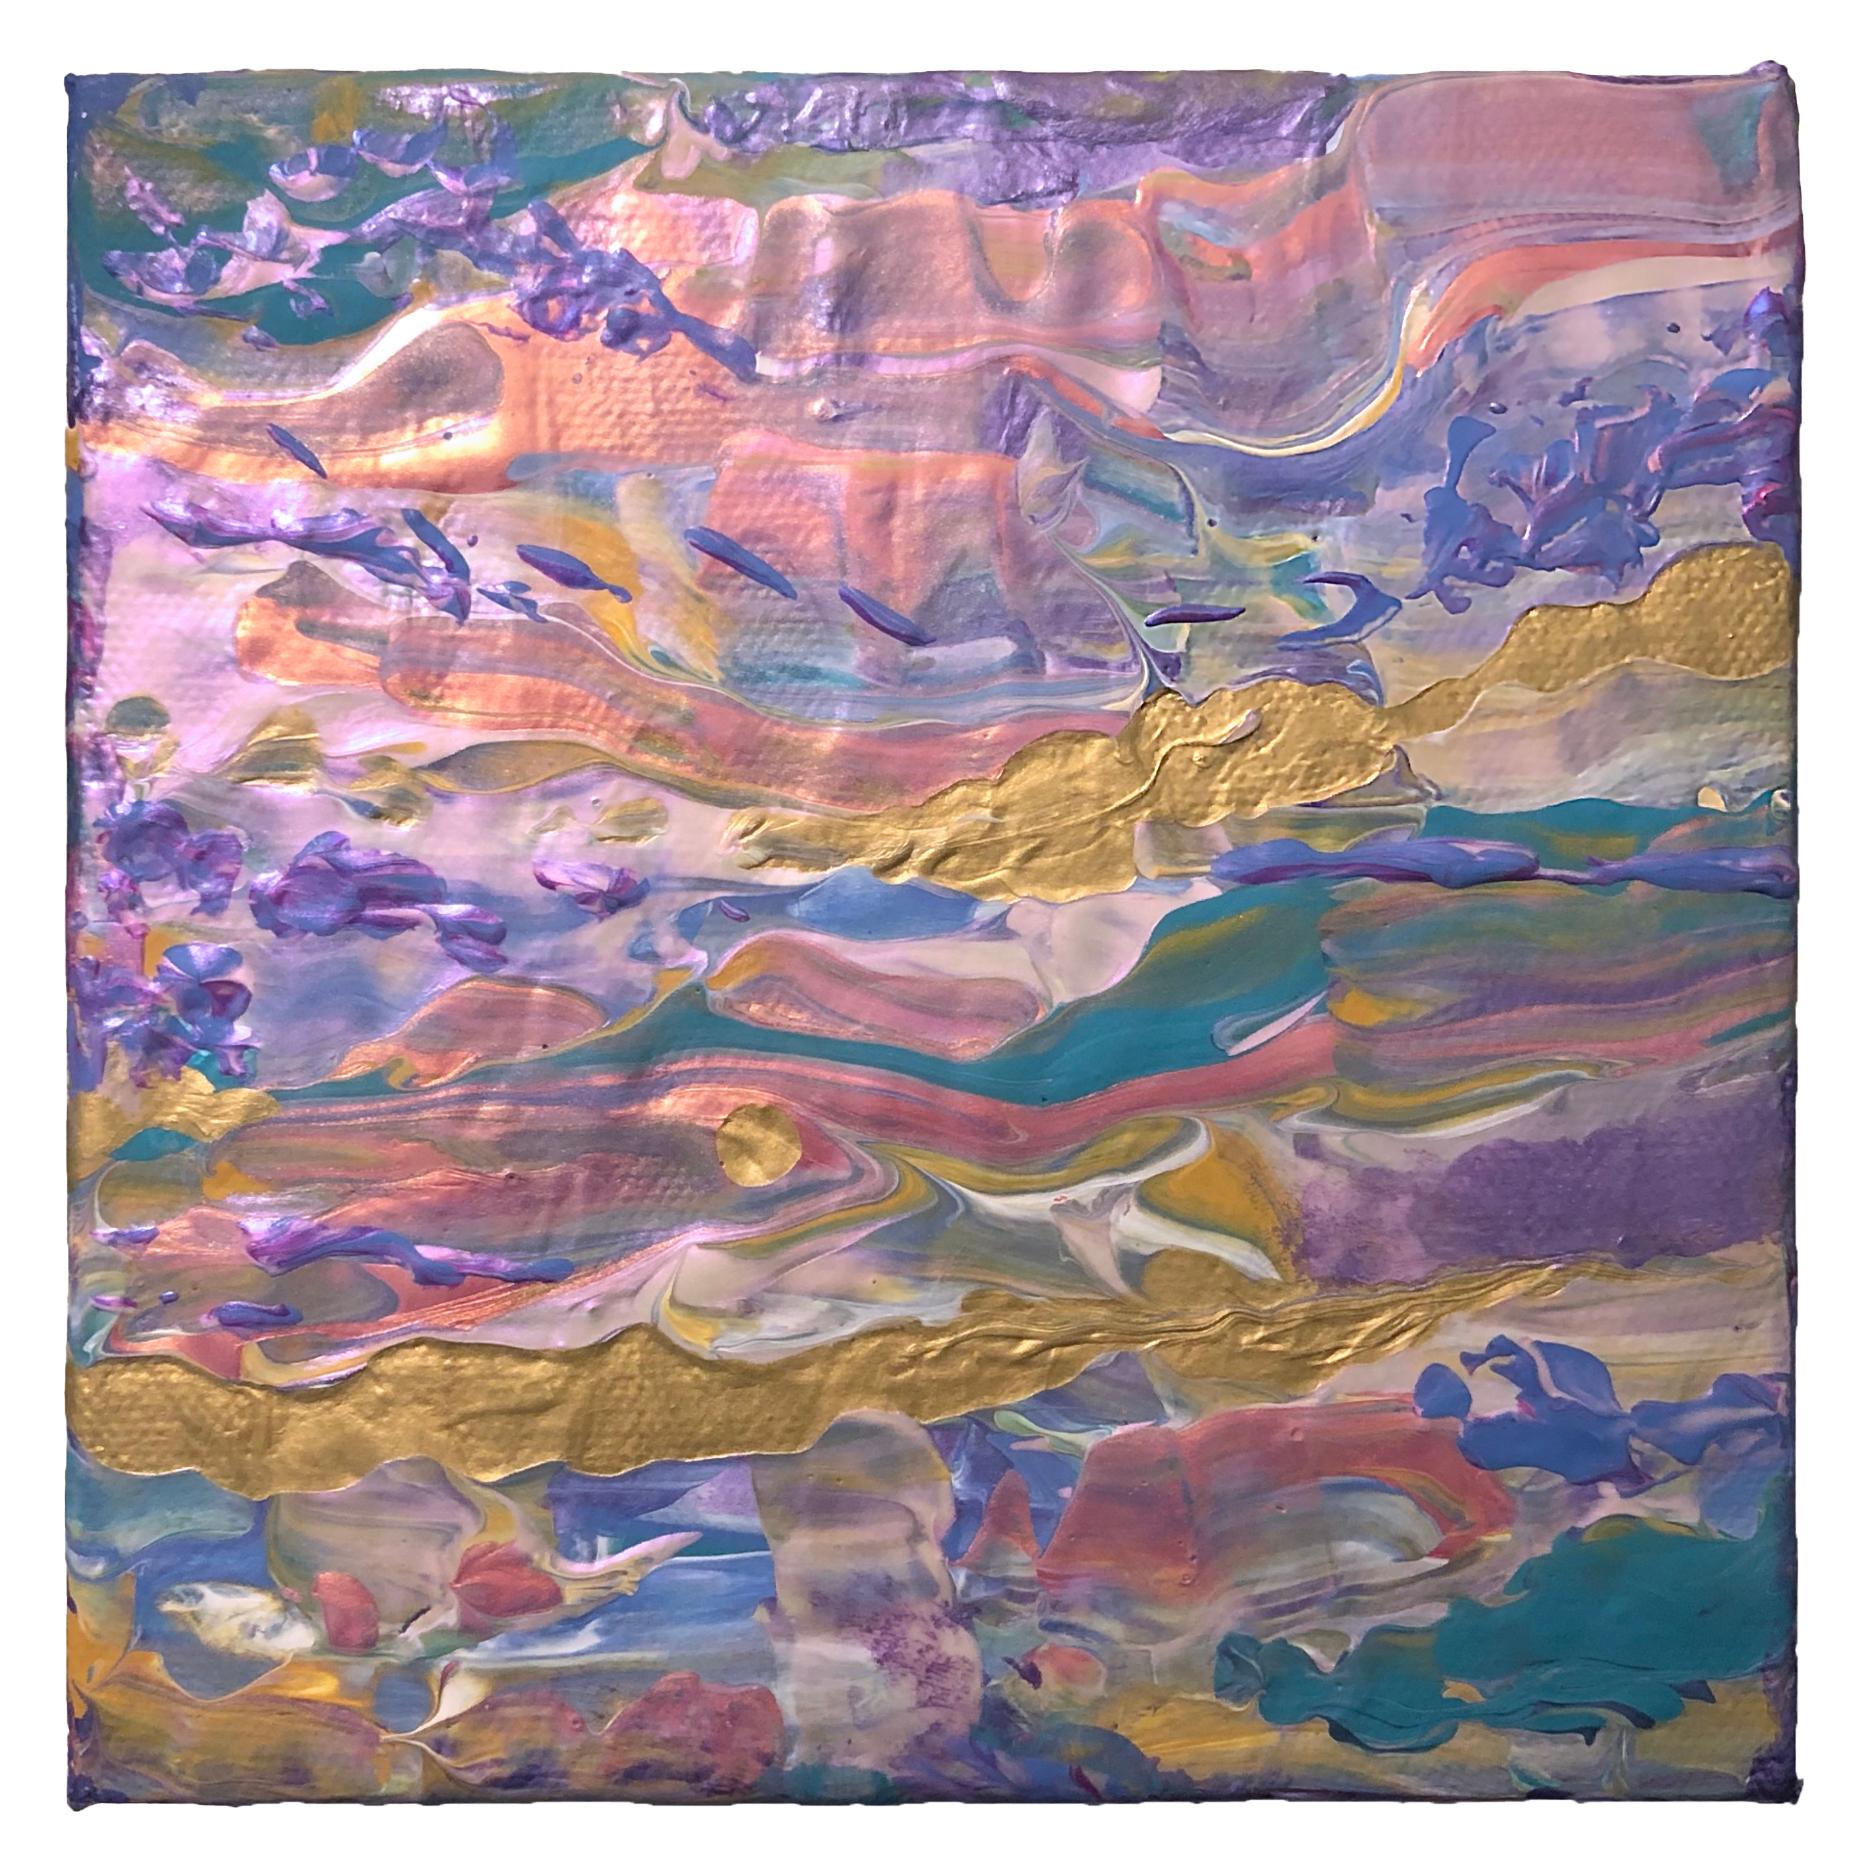 Storm on jupiter   img 4755 v3 cropped sharp100 blue filter white bkgrnd ig rhso4j